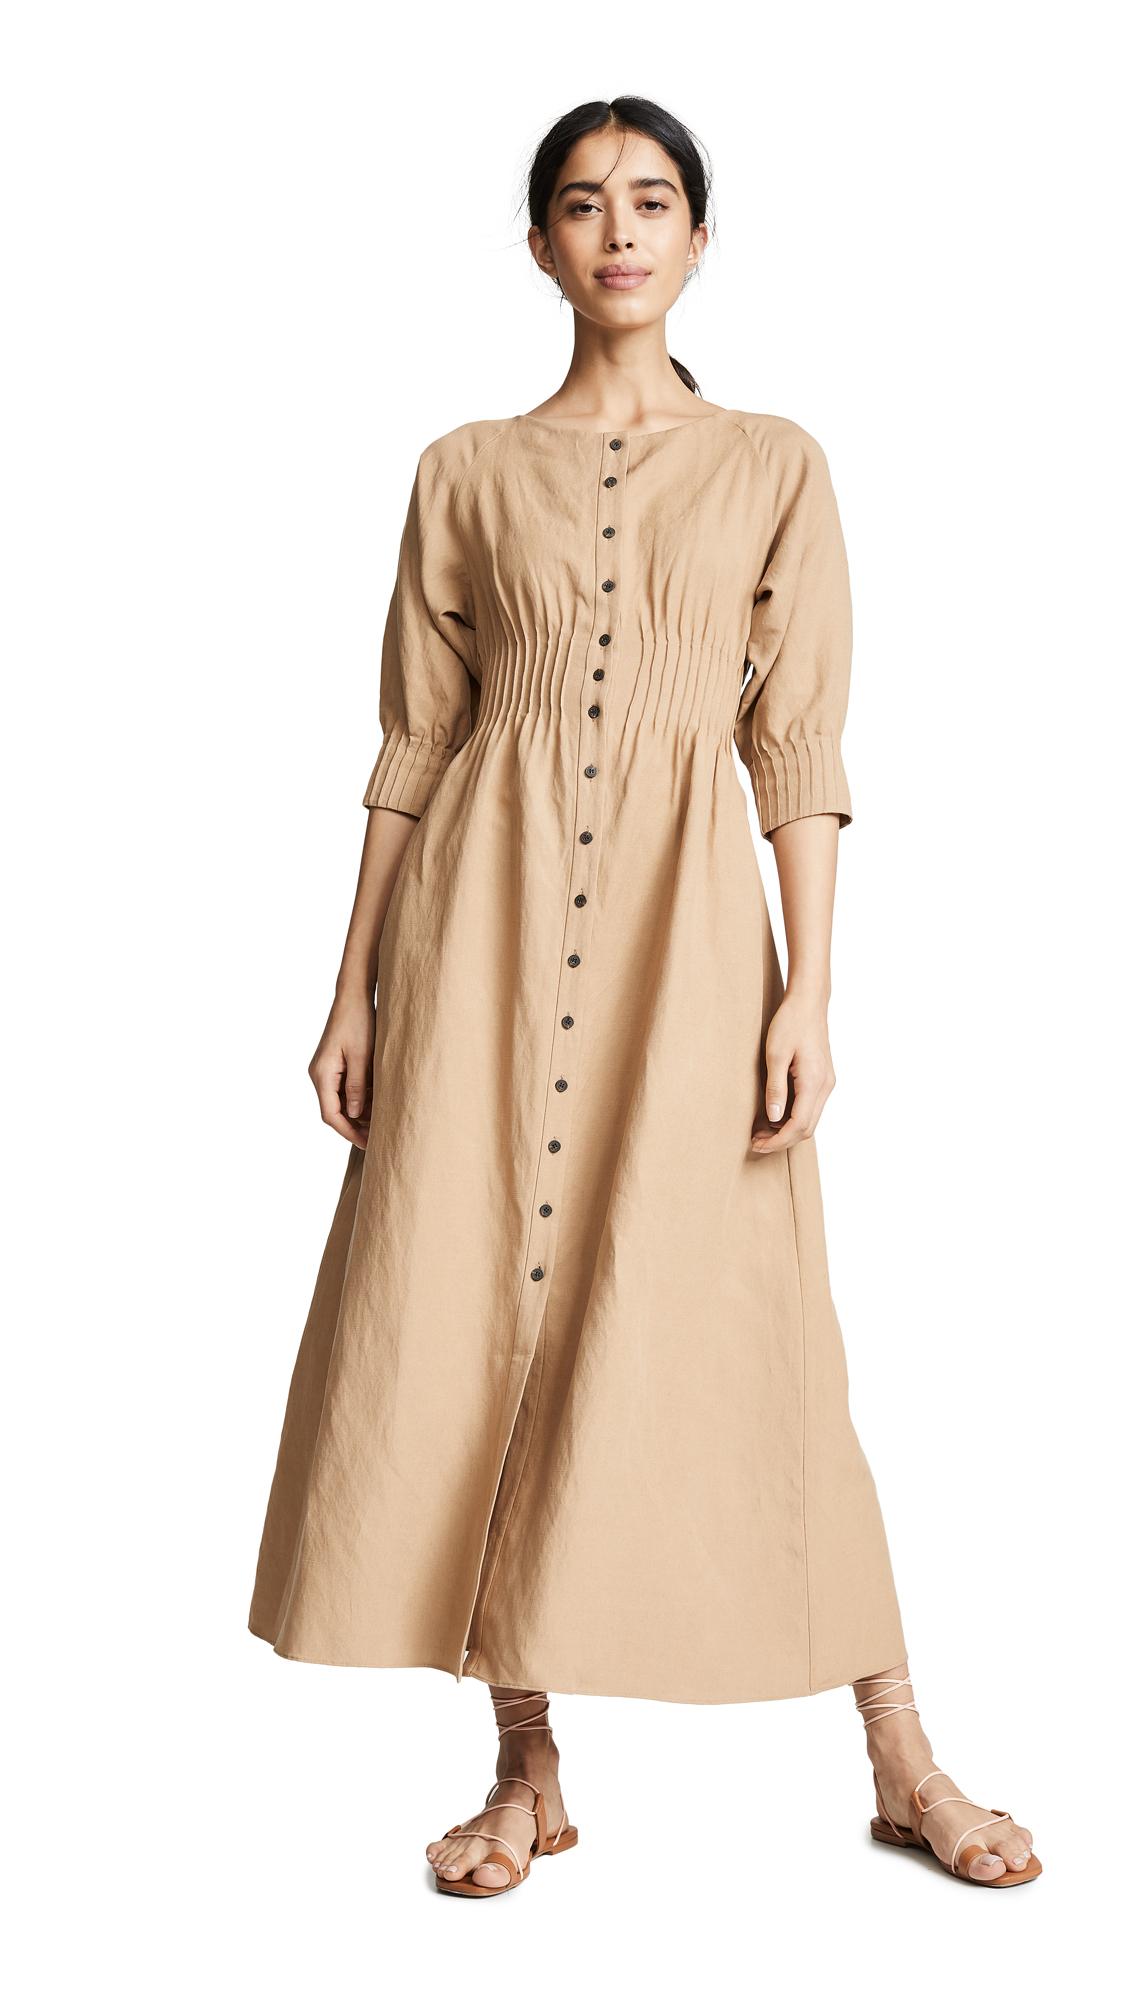 Mara Hoffman Amia Dress - Khaki